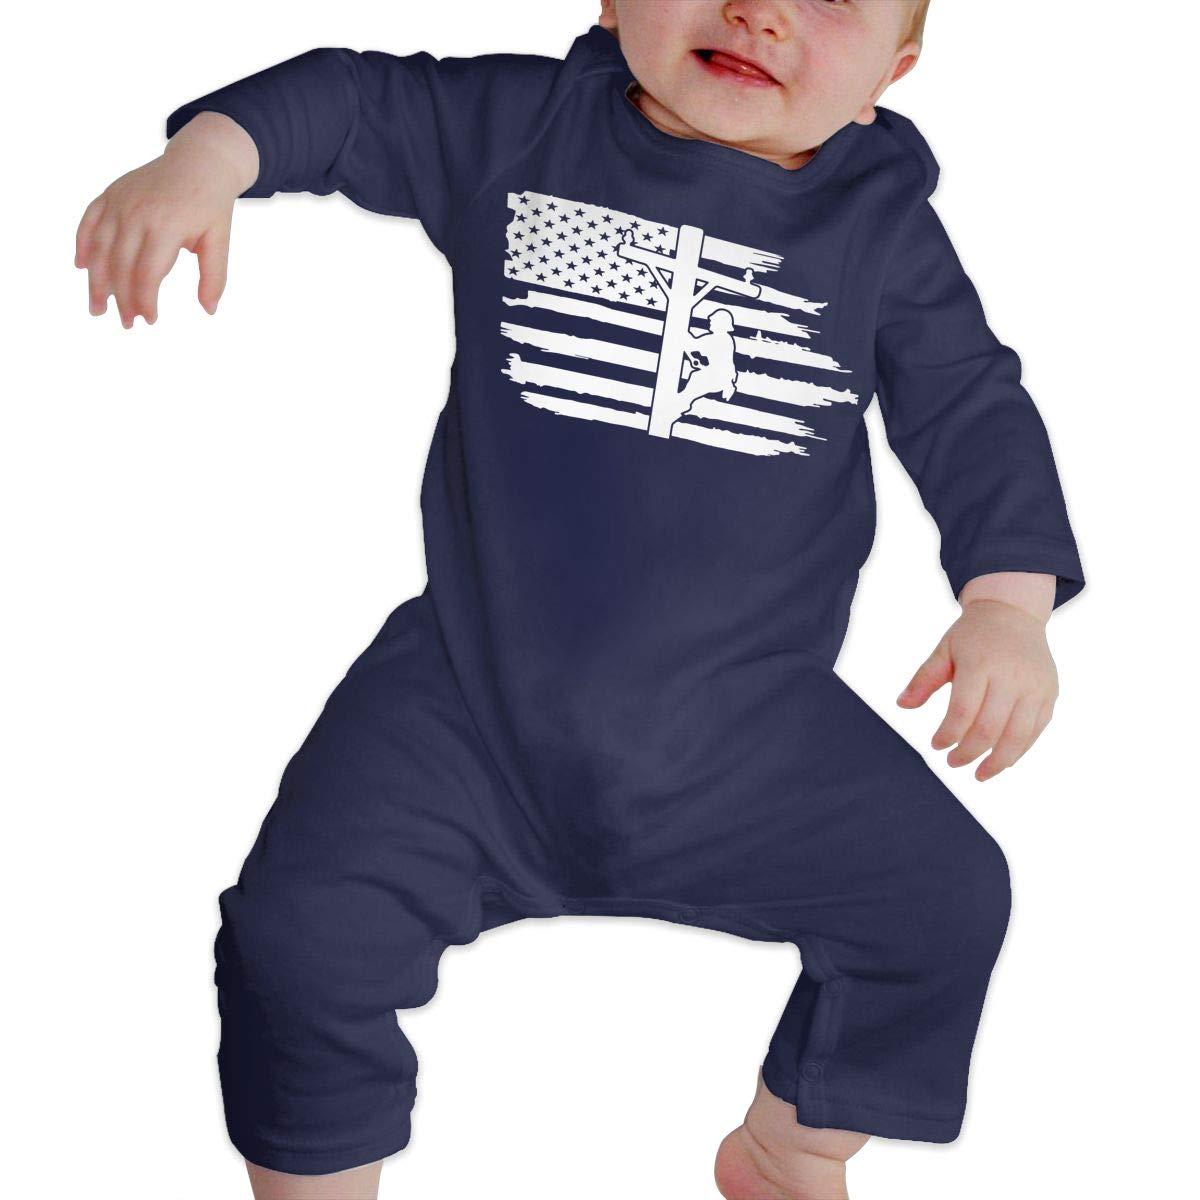 LBJQ8 Lineman Powerline Technician American Flag Infant Baby Boy Girl Soft /& Breathable Bodysuits Coverall Jumpsuit